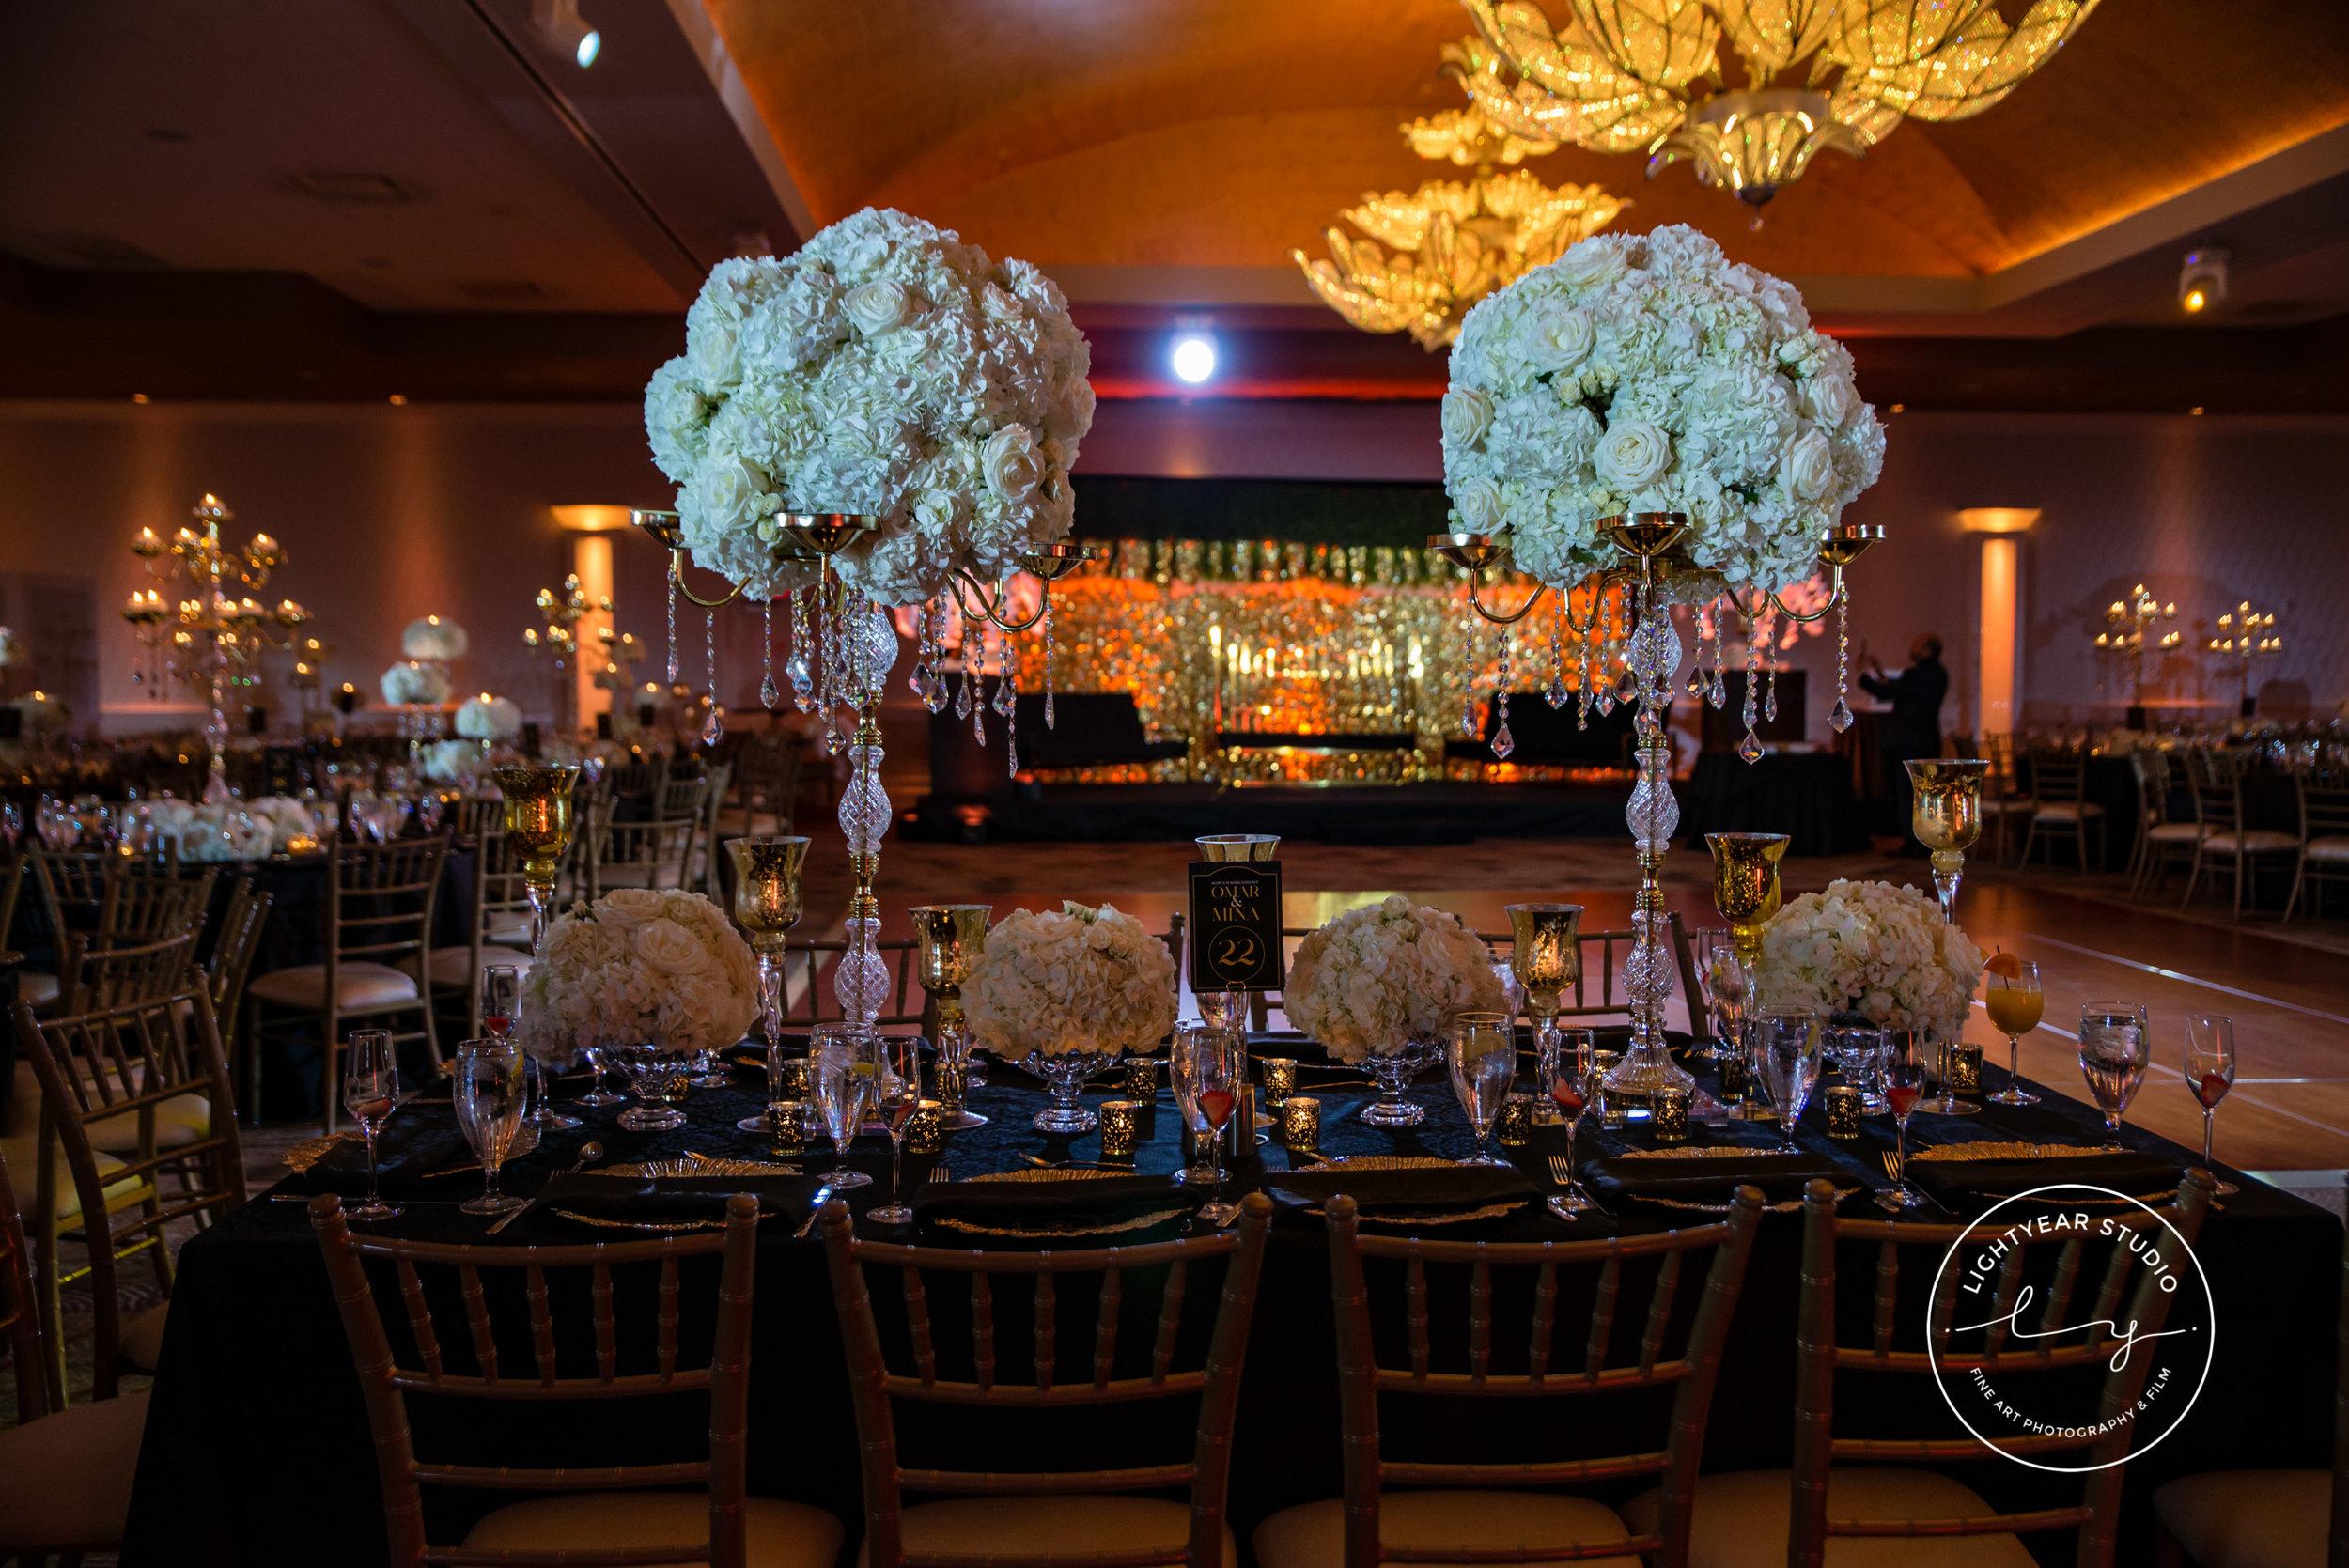 INDIAN WEDDING TABLE DECOR 2.jpg